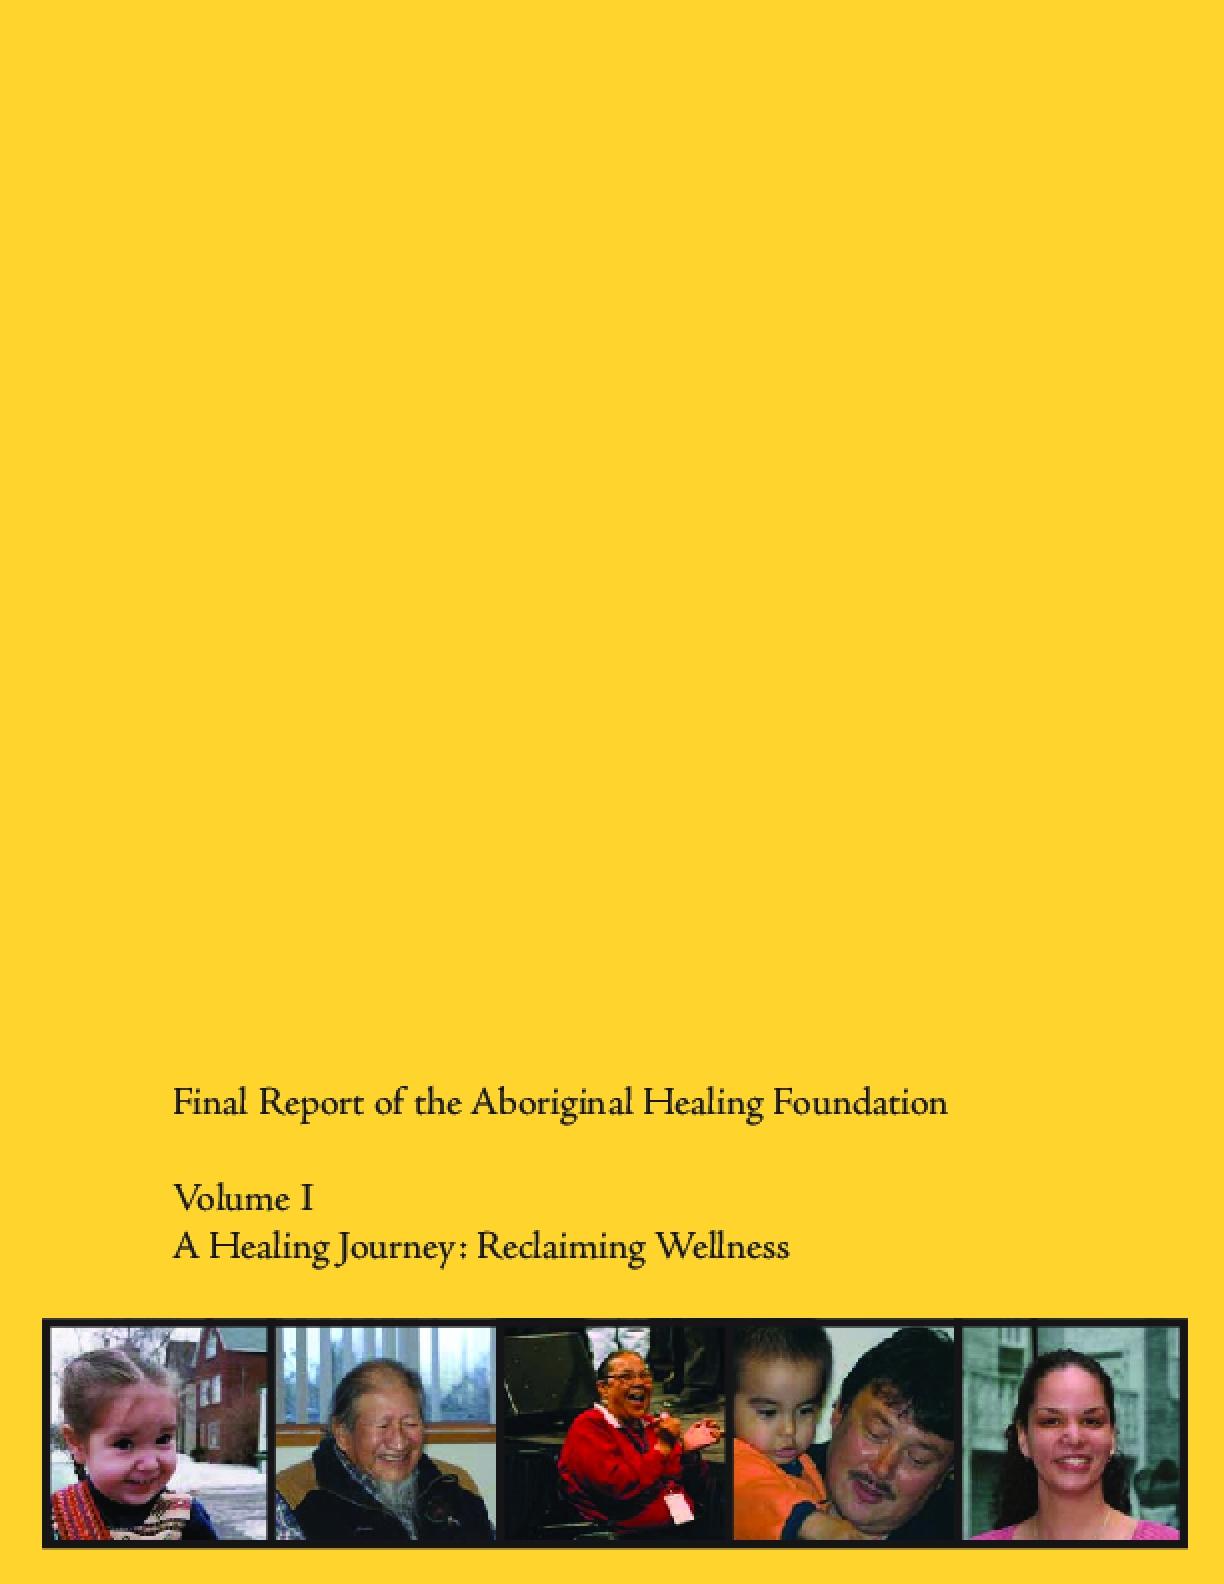 Final Report of the Aboriginal Healing Foundation Volume I - A Healing Journey: Reclaiming Wellness